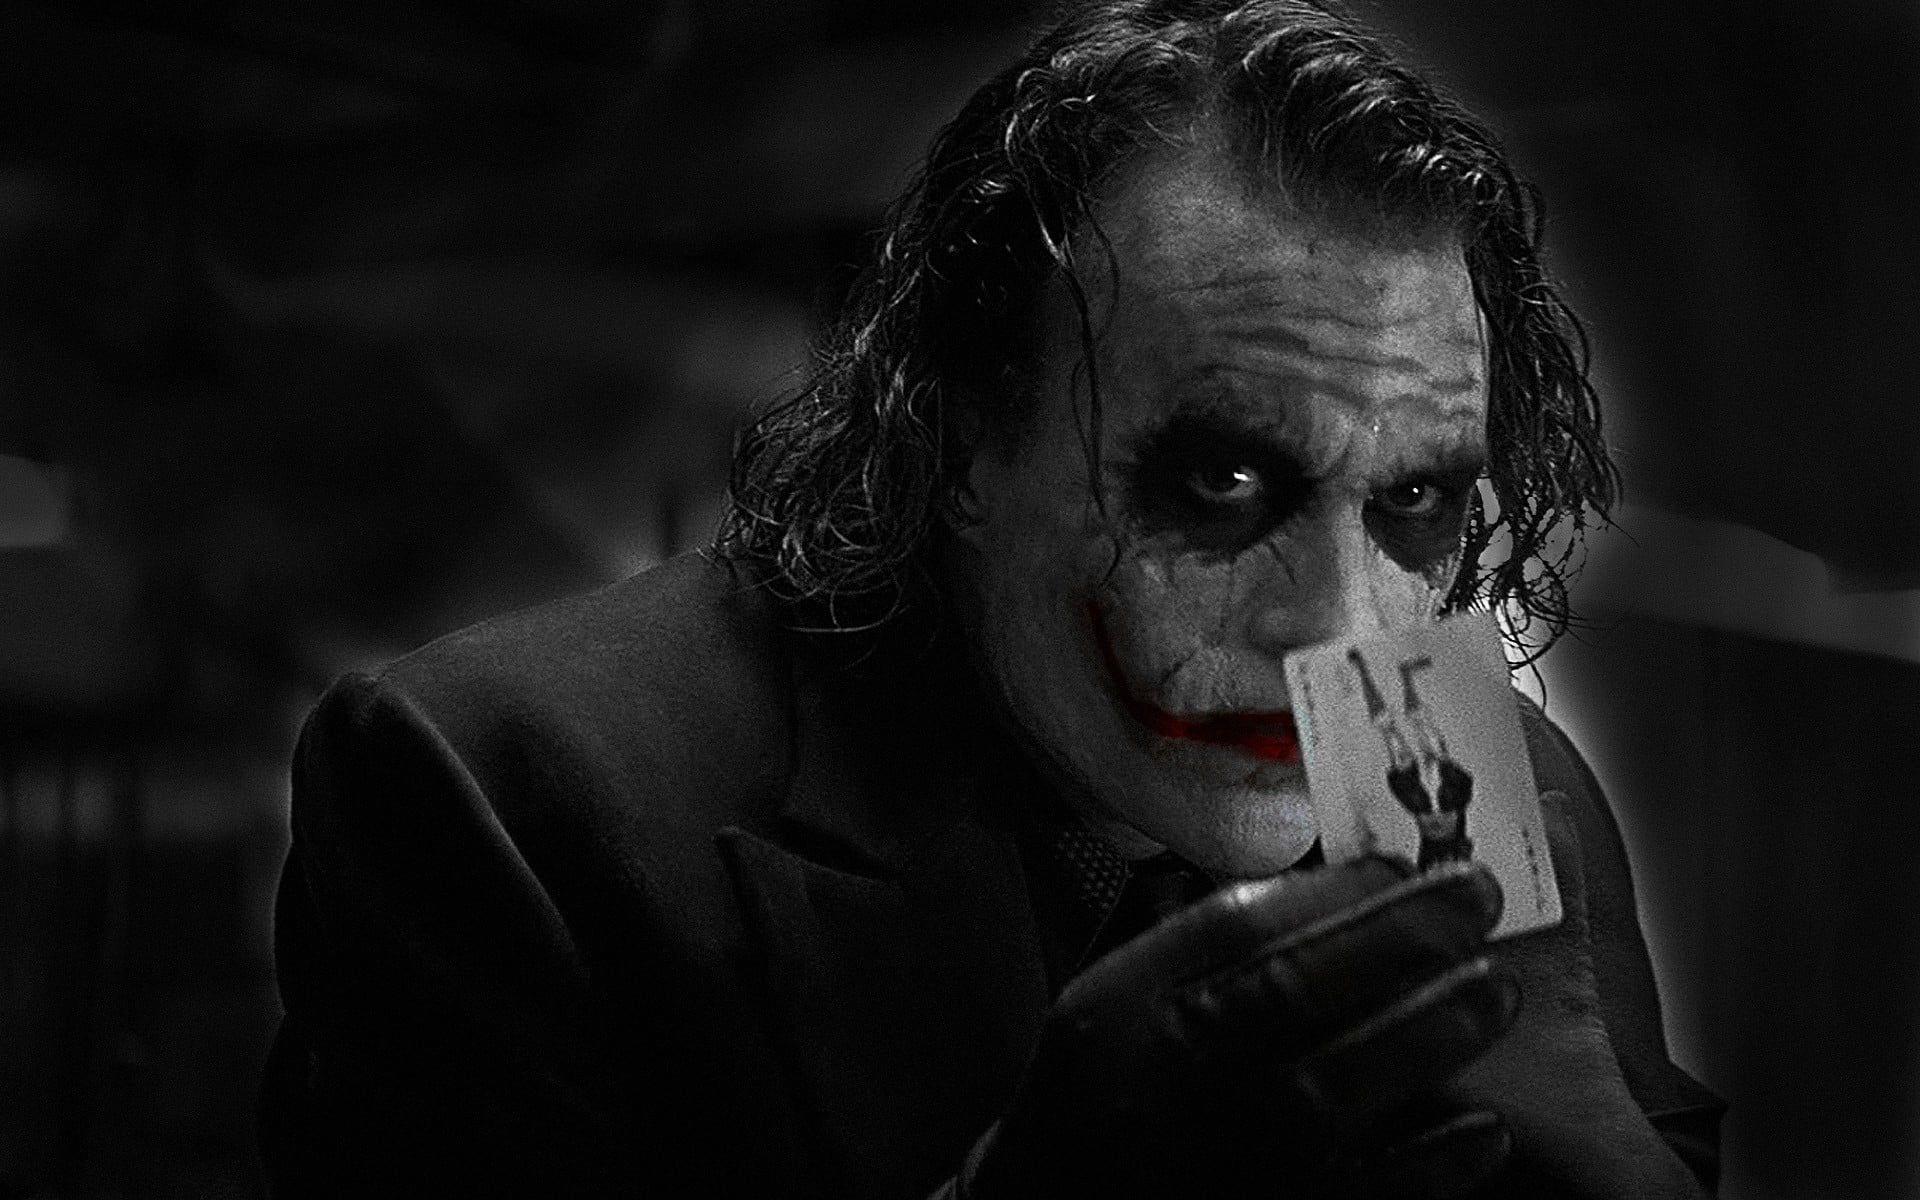 Joker Batman Heath Ledger Movies Joker Batman Heath Ledger Movies Is An Hd Desktop Wallpaper Posted I Dark Knight Wallpaper Joker Wallpaper Joker Dark Knight